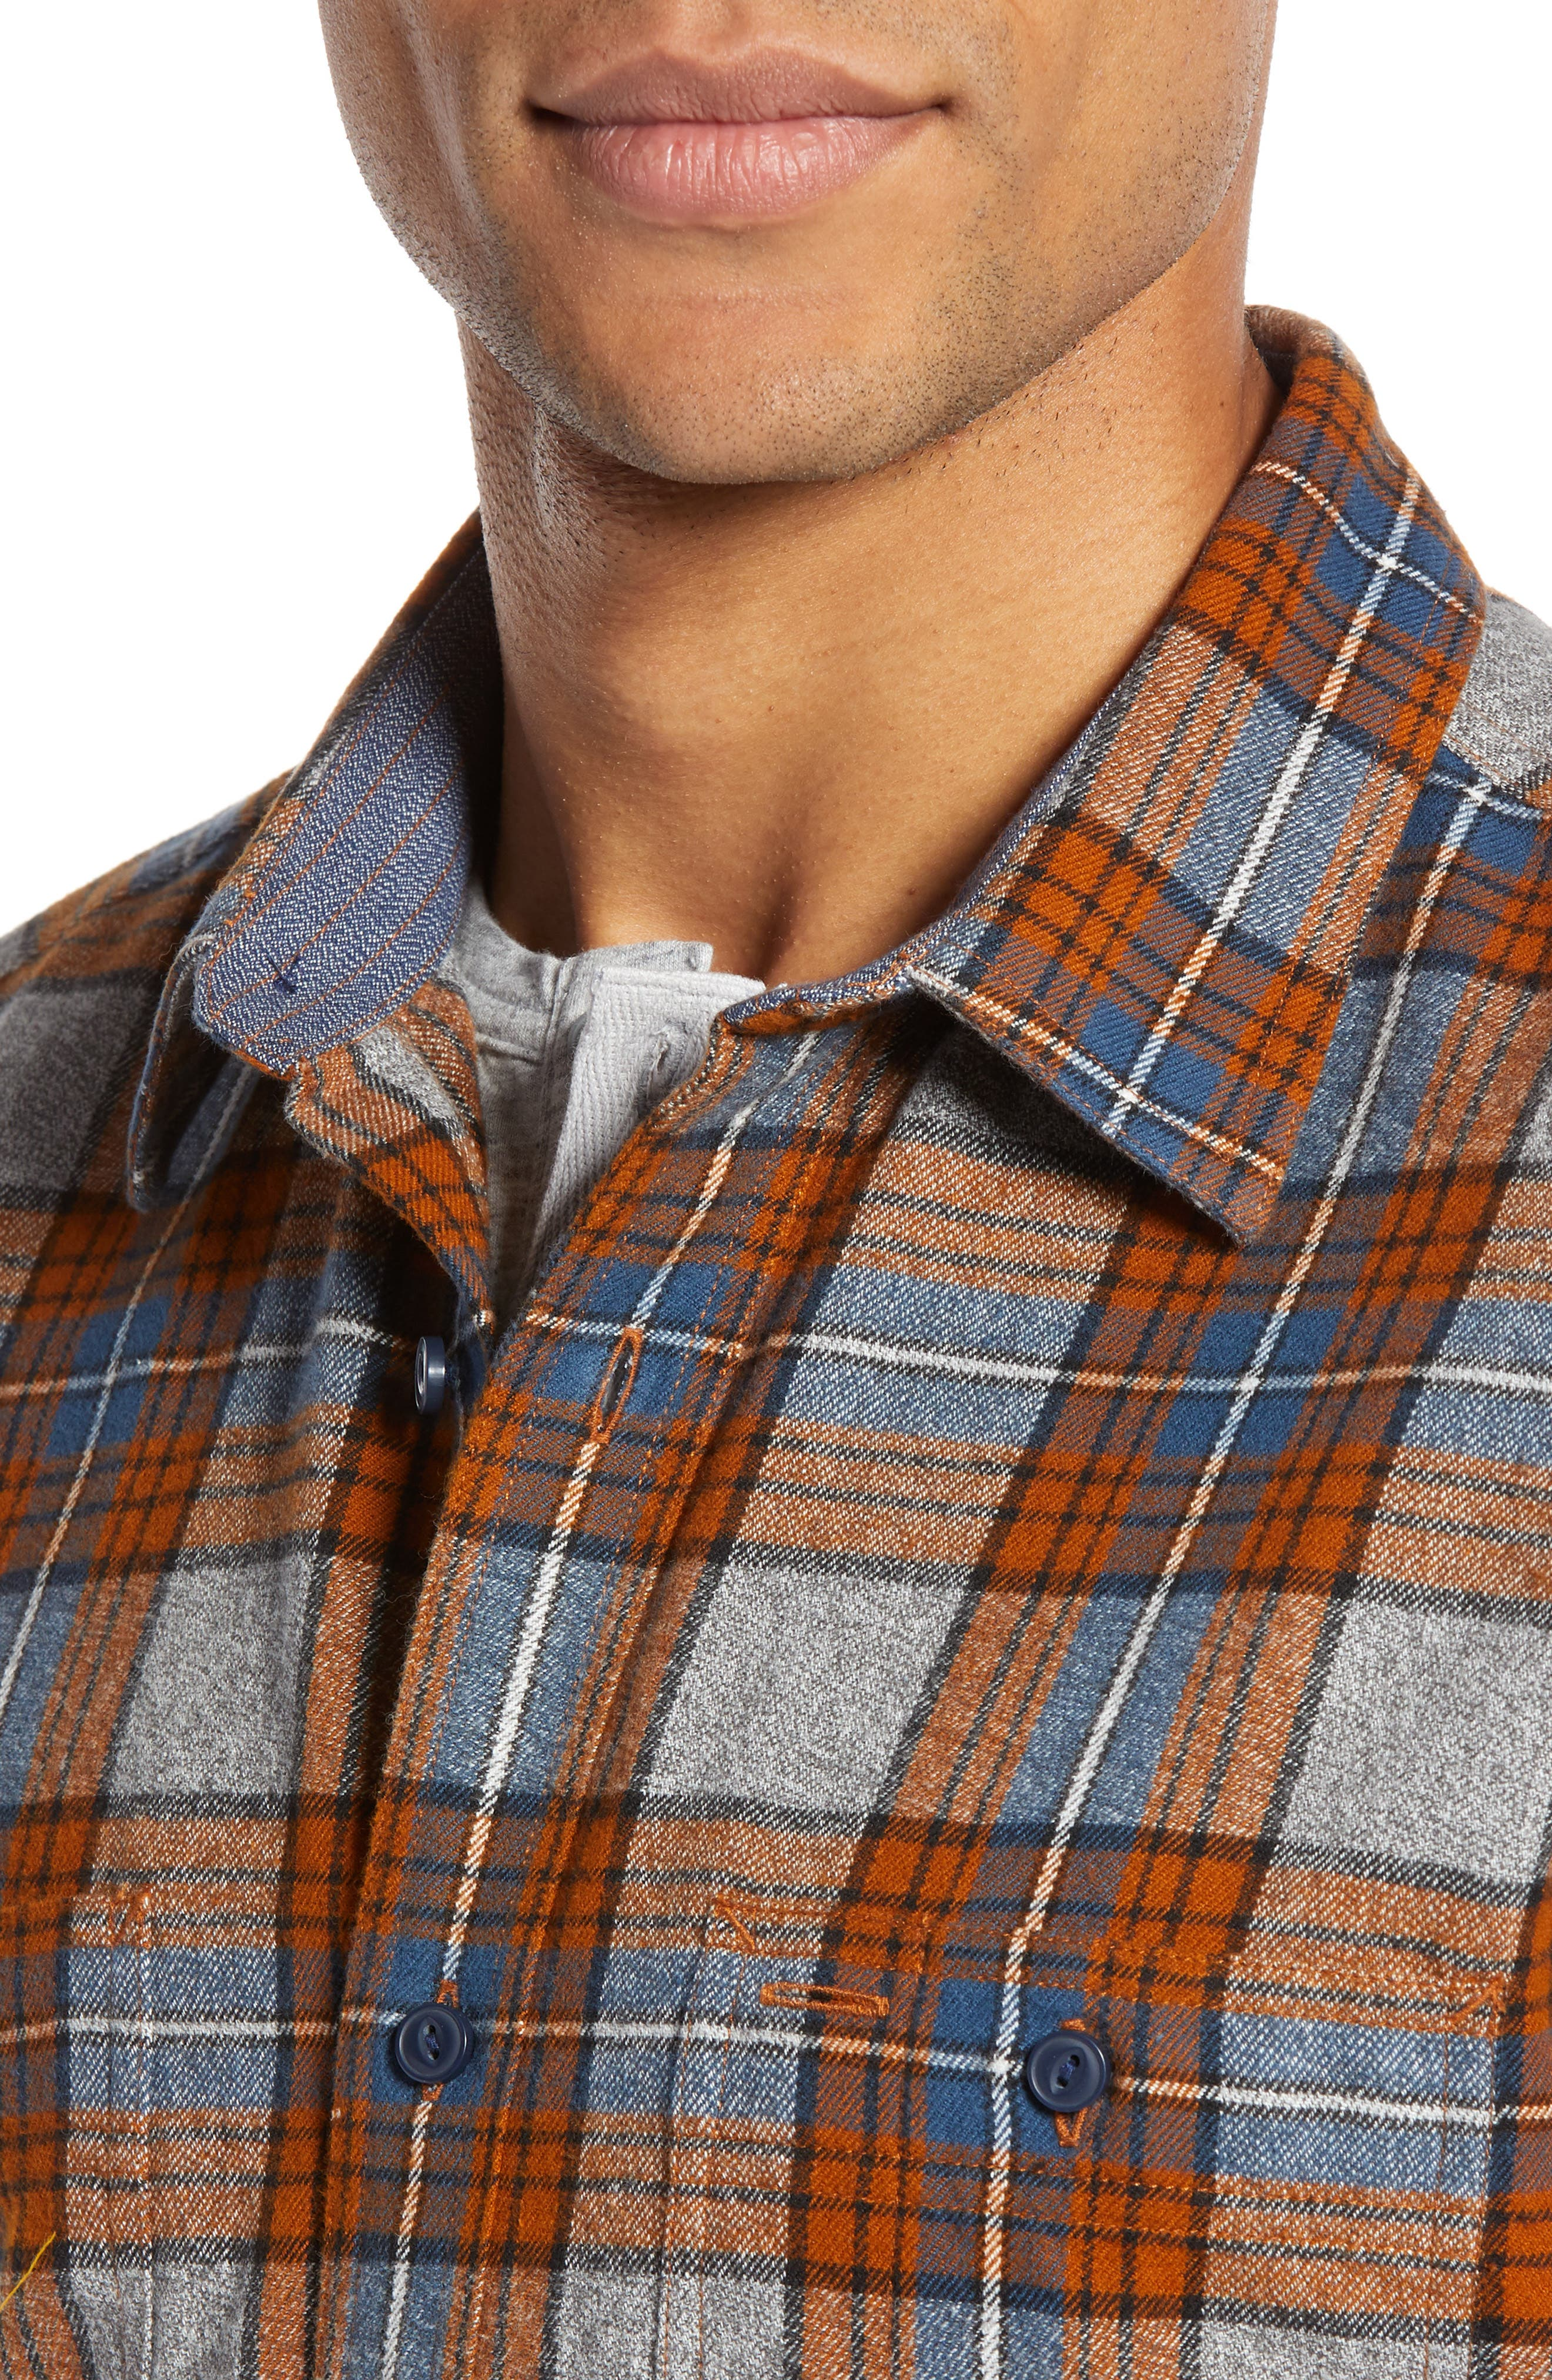 Regular Fit Workwear Plaid Flannel Shirt,                             Alternate thumbnail 4, color,                             RUST AUTUMN BLUE PLAID